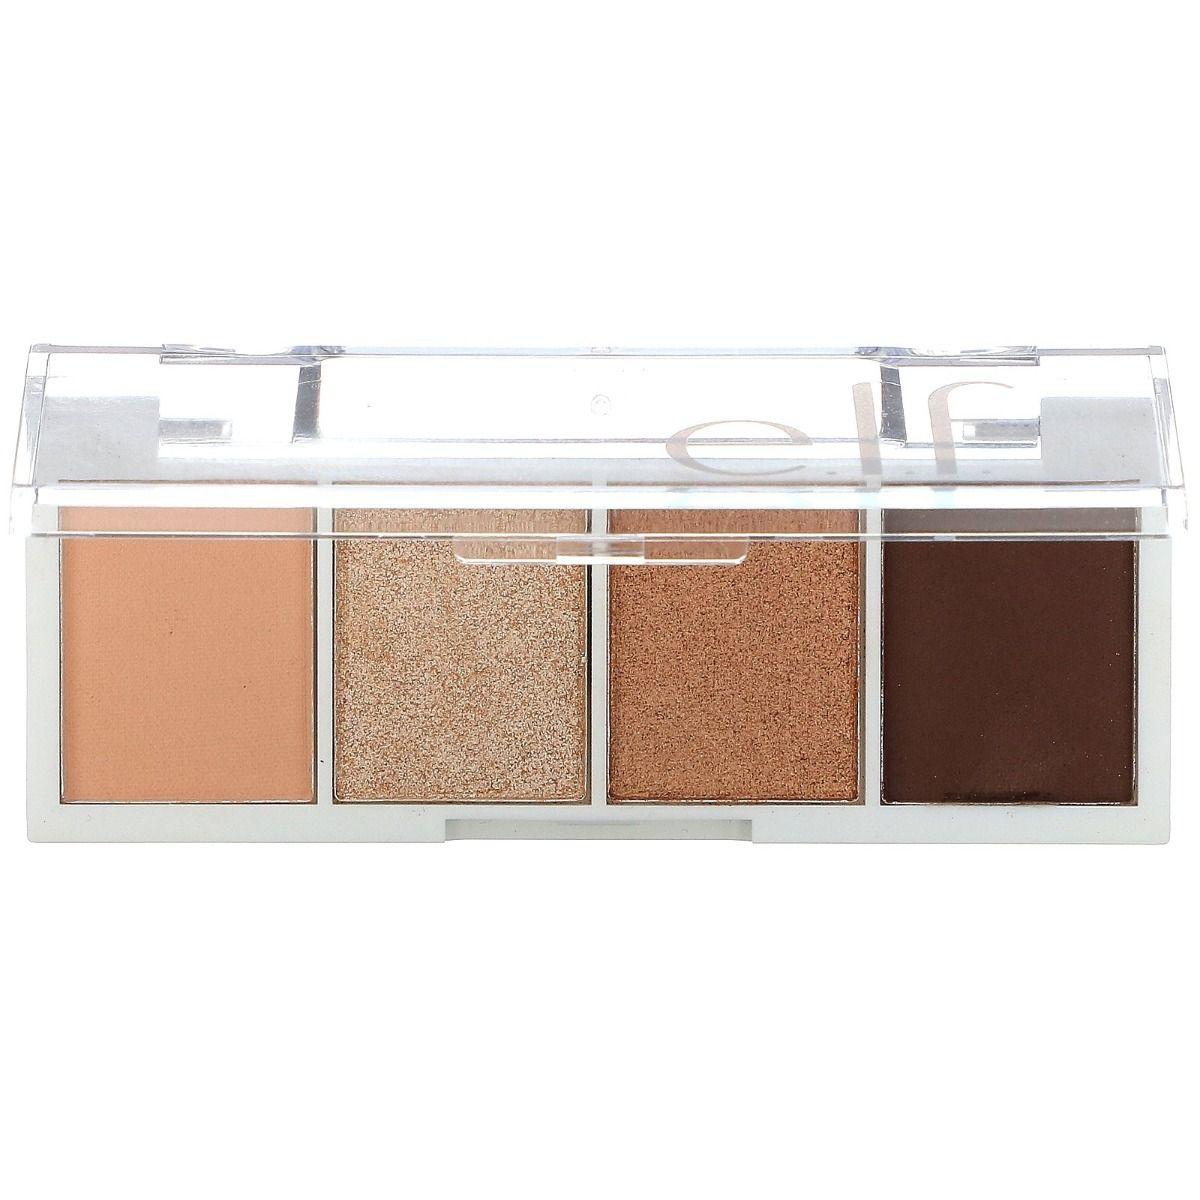 e.l.f. Cosmetics Bite Size Eyeshadows Cream & Sugar